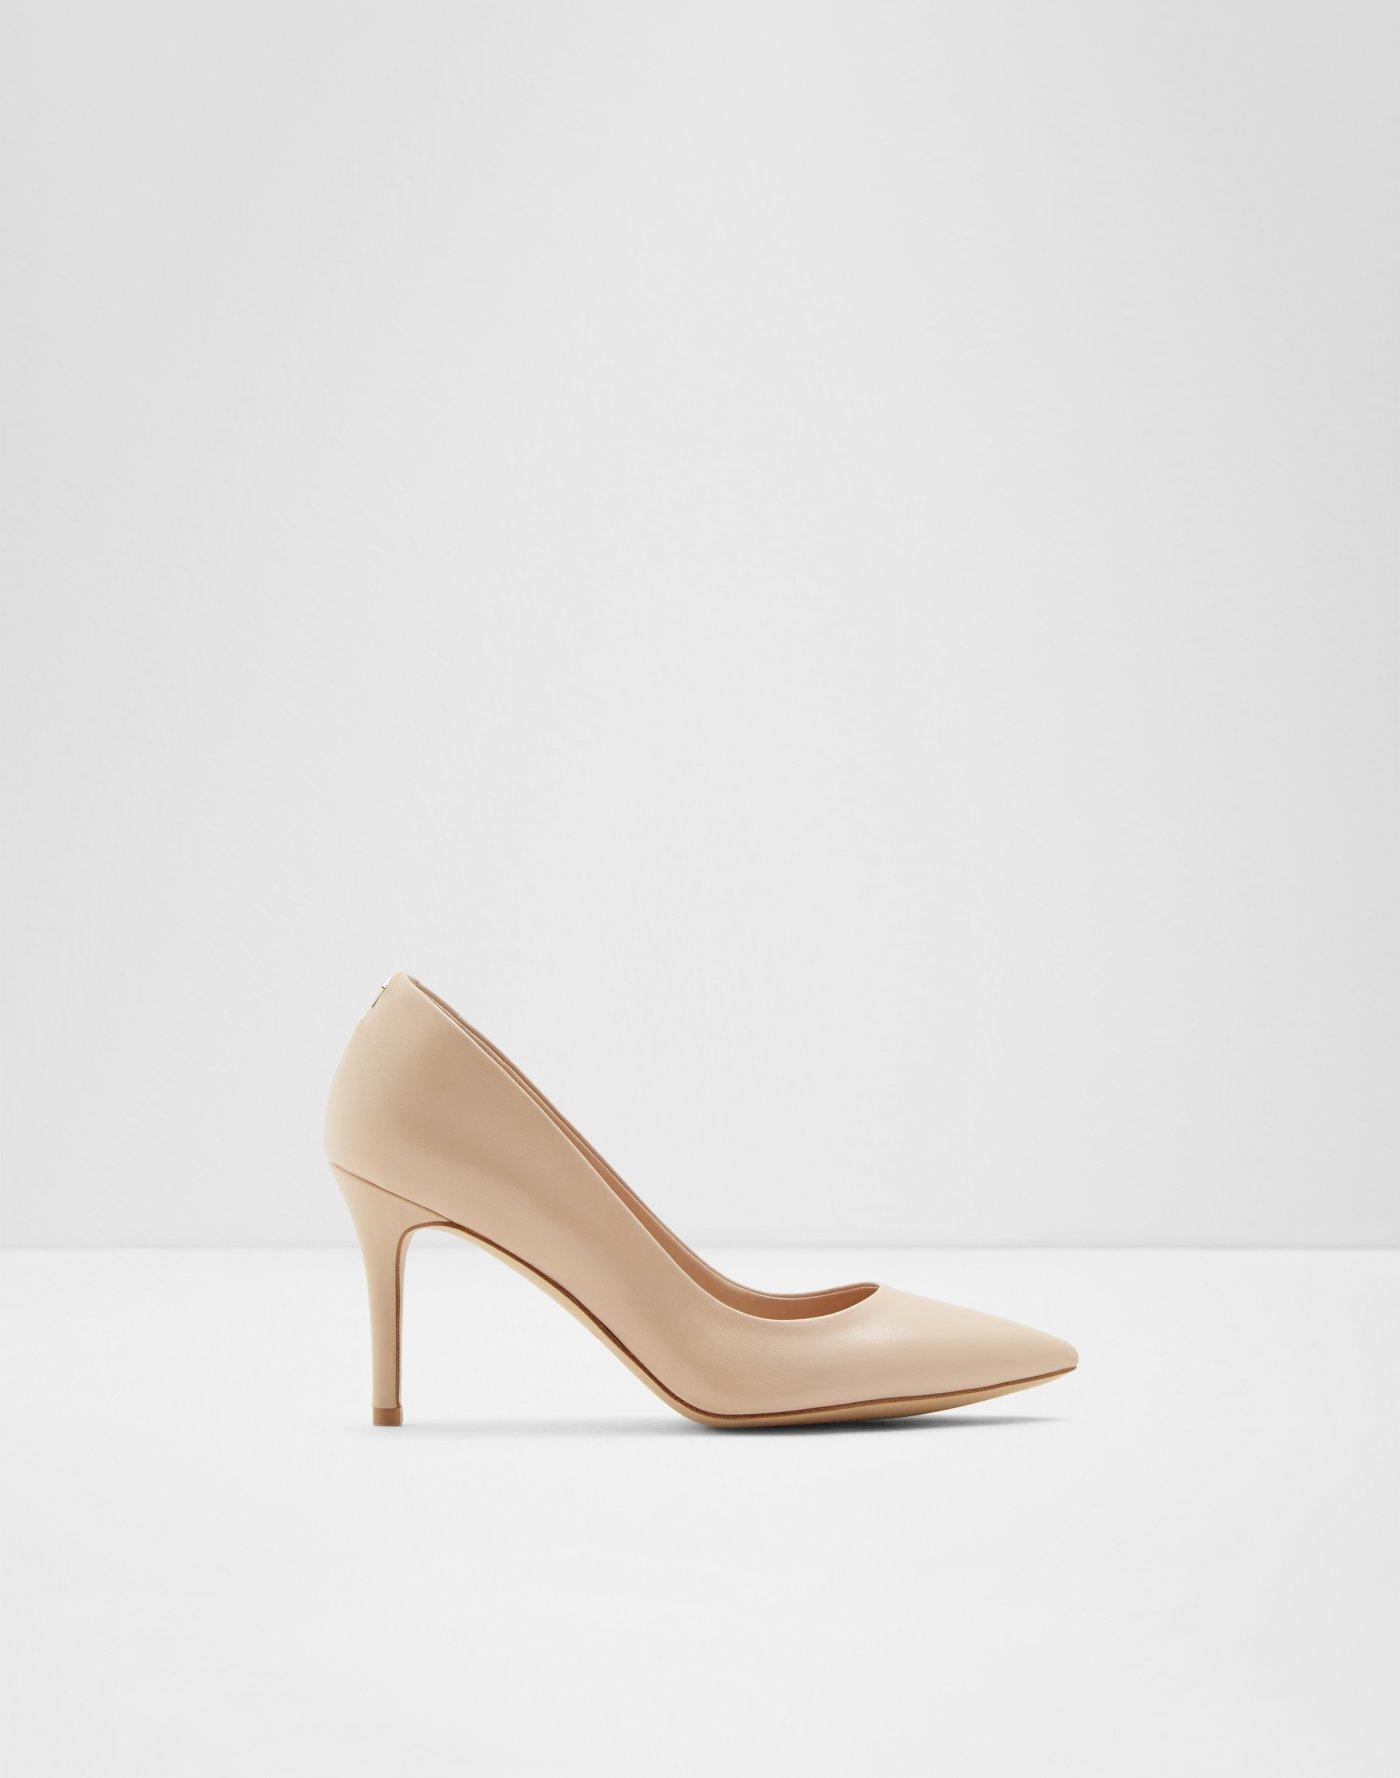 d93e21f64 Women's Heels | Black, Red, Nude, Silver Heels | ALDO US | Aldoshoes.com US